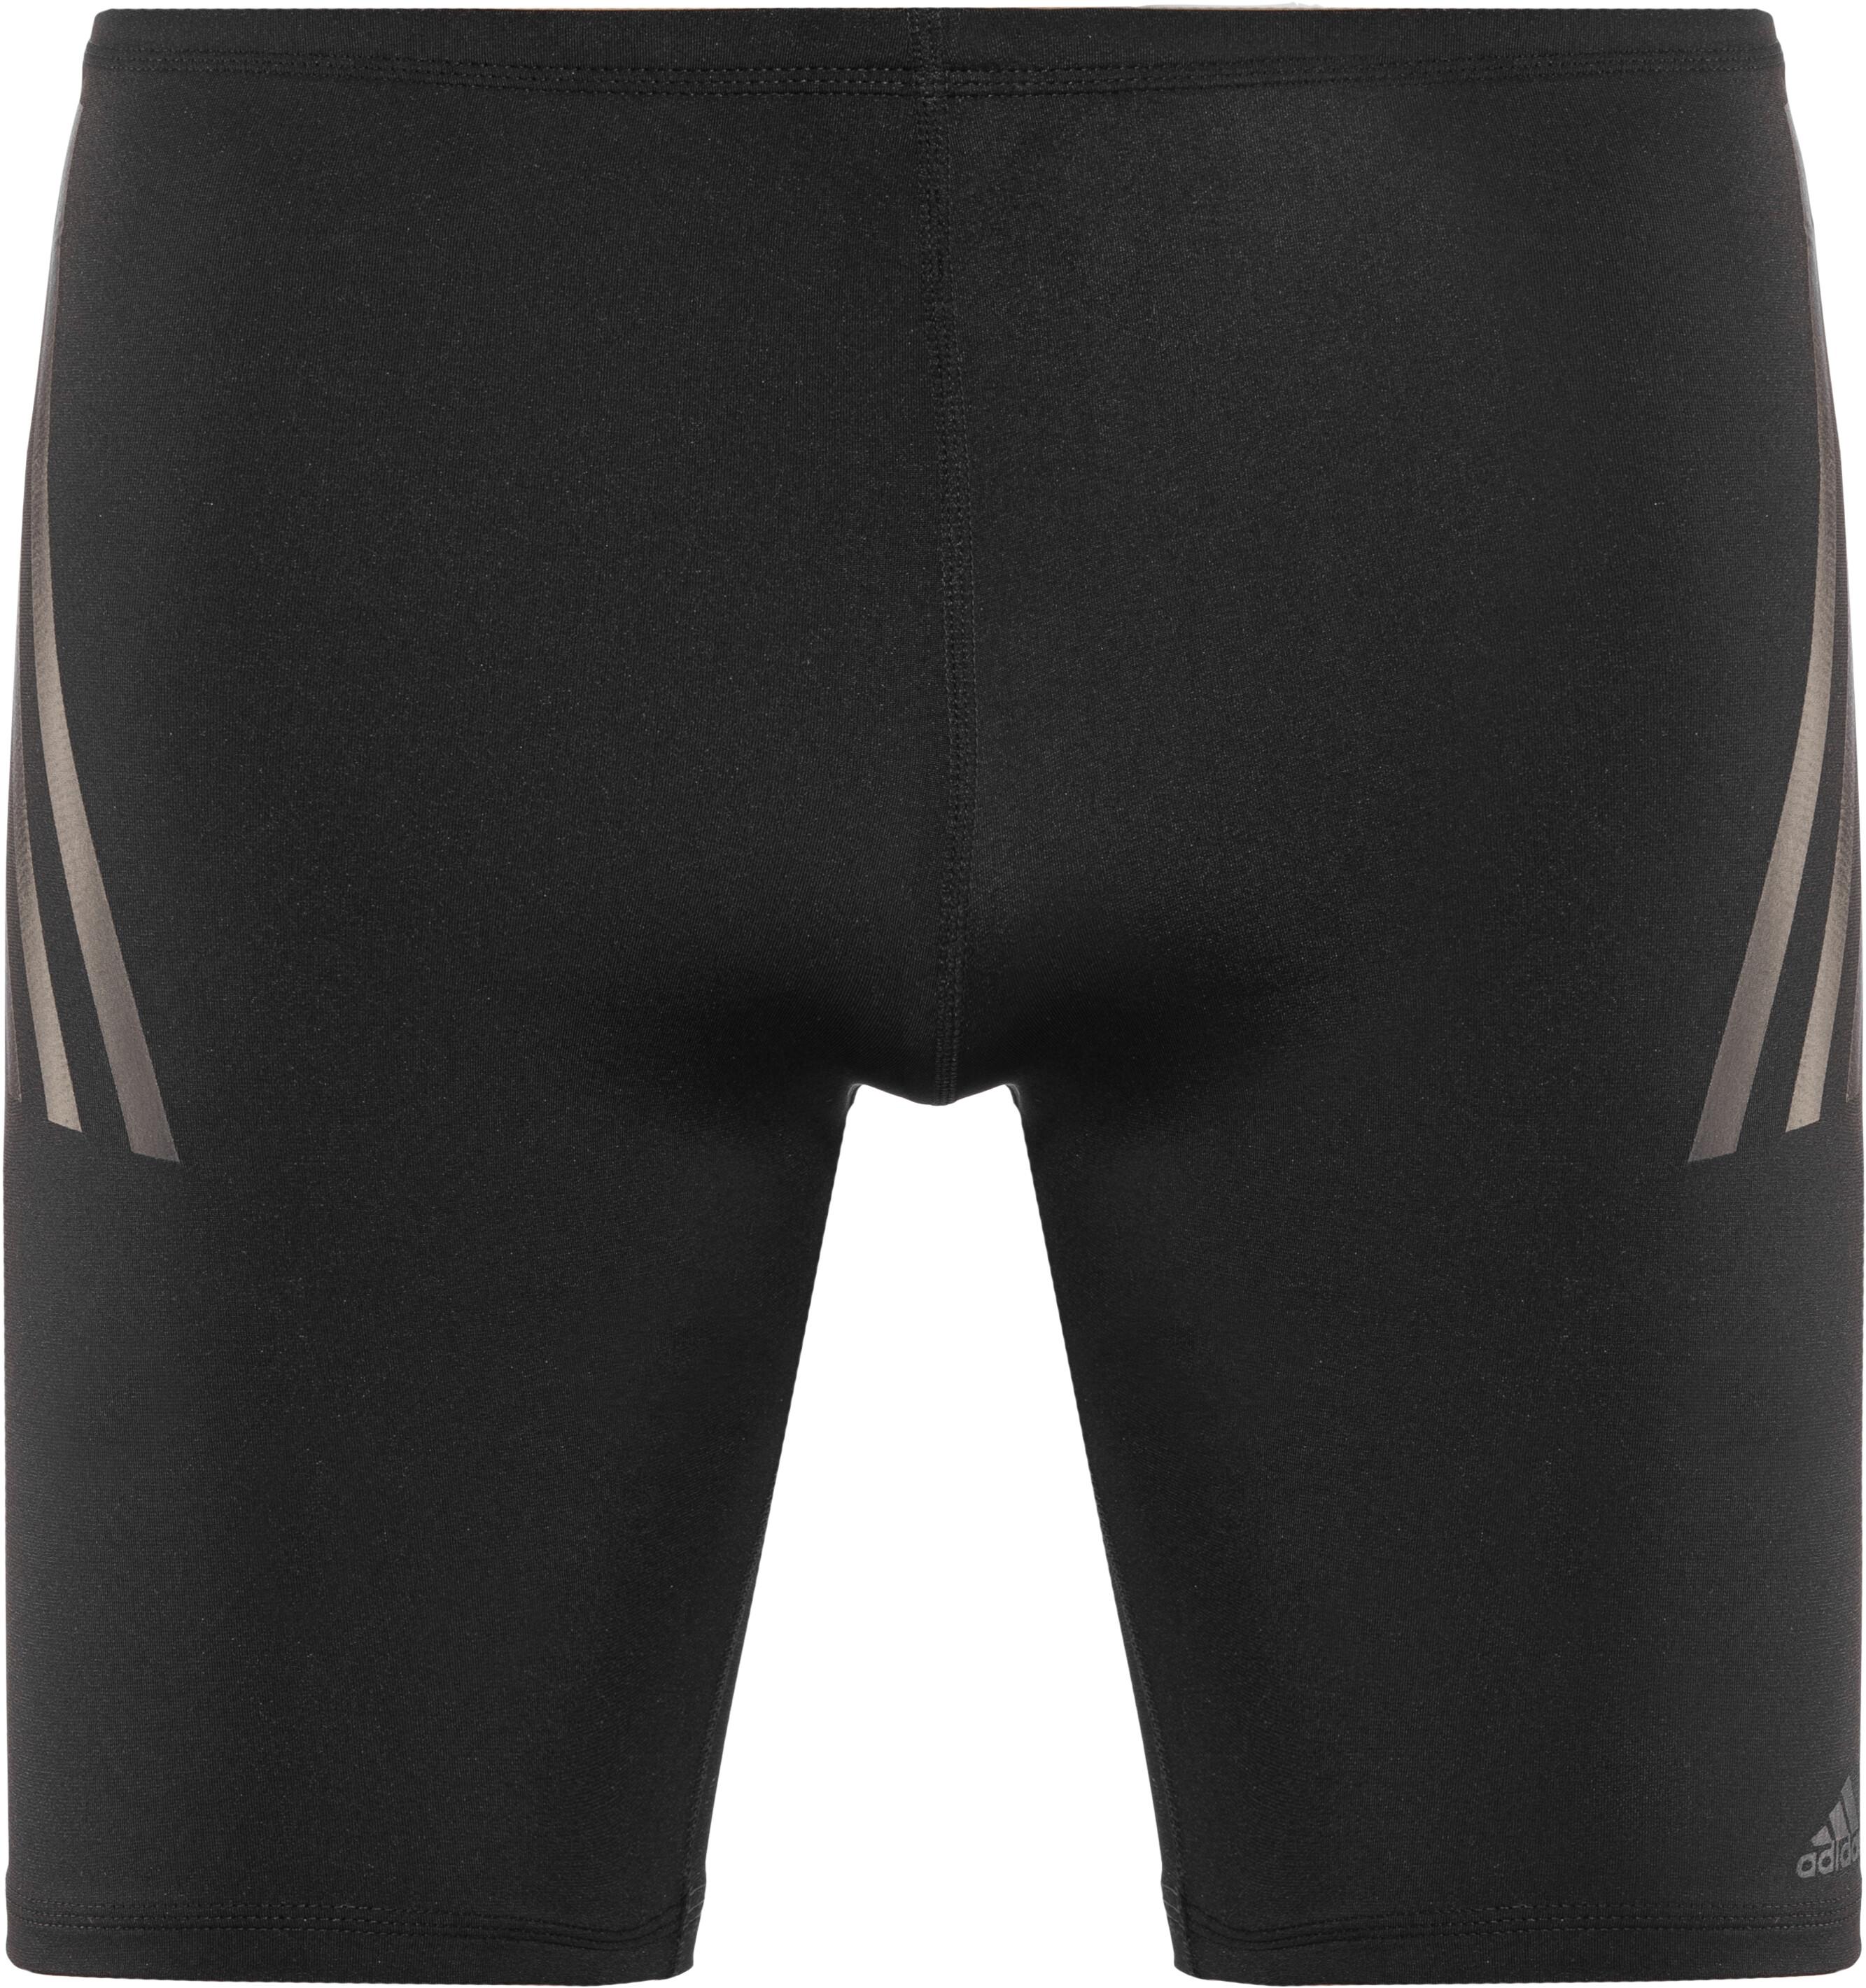 8ab0a6b245bba1 adidas Pro 3-Stripes zwembroek Heren, black/carbon l Online outdoor ...